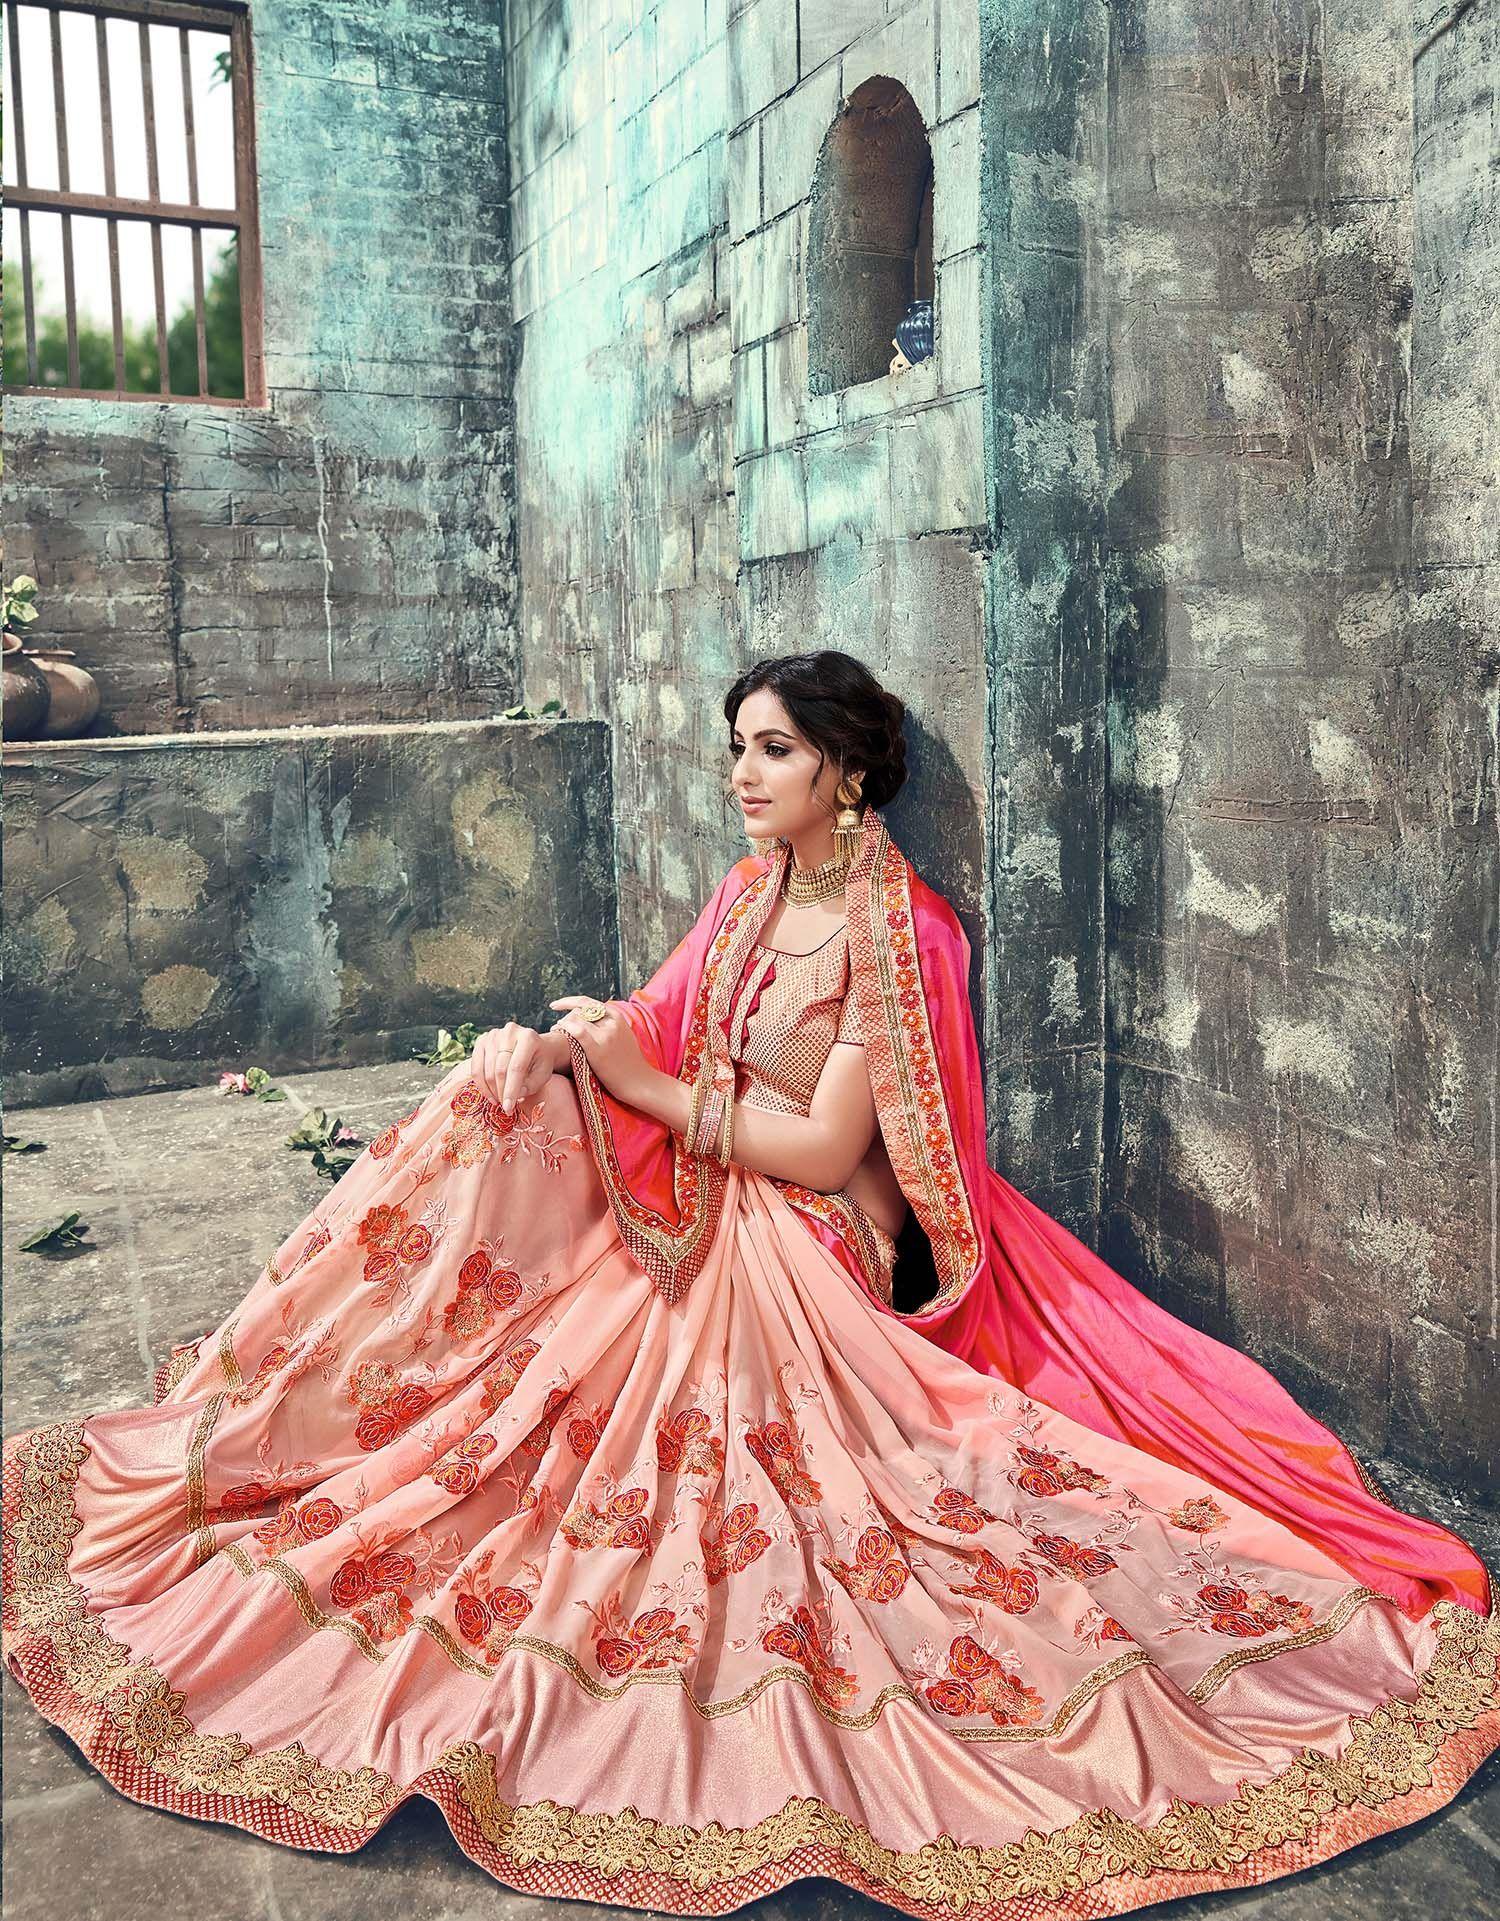 Pin by JNB Style on Saree in 2019 | Saree, Saree ...